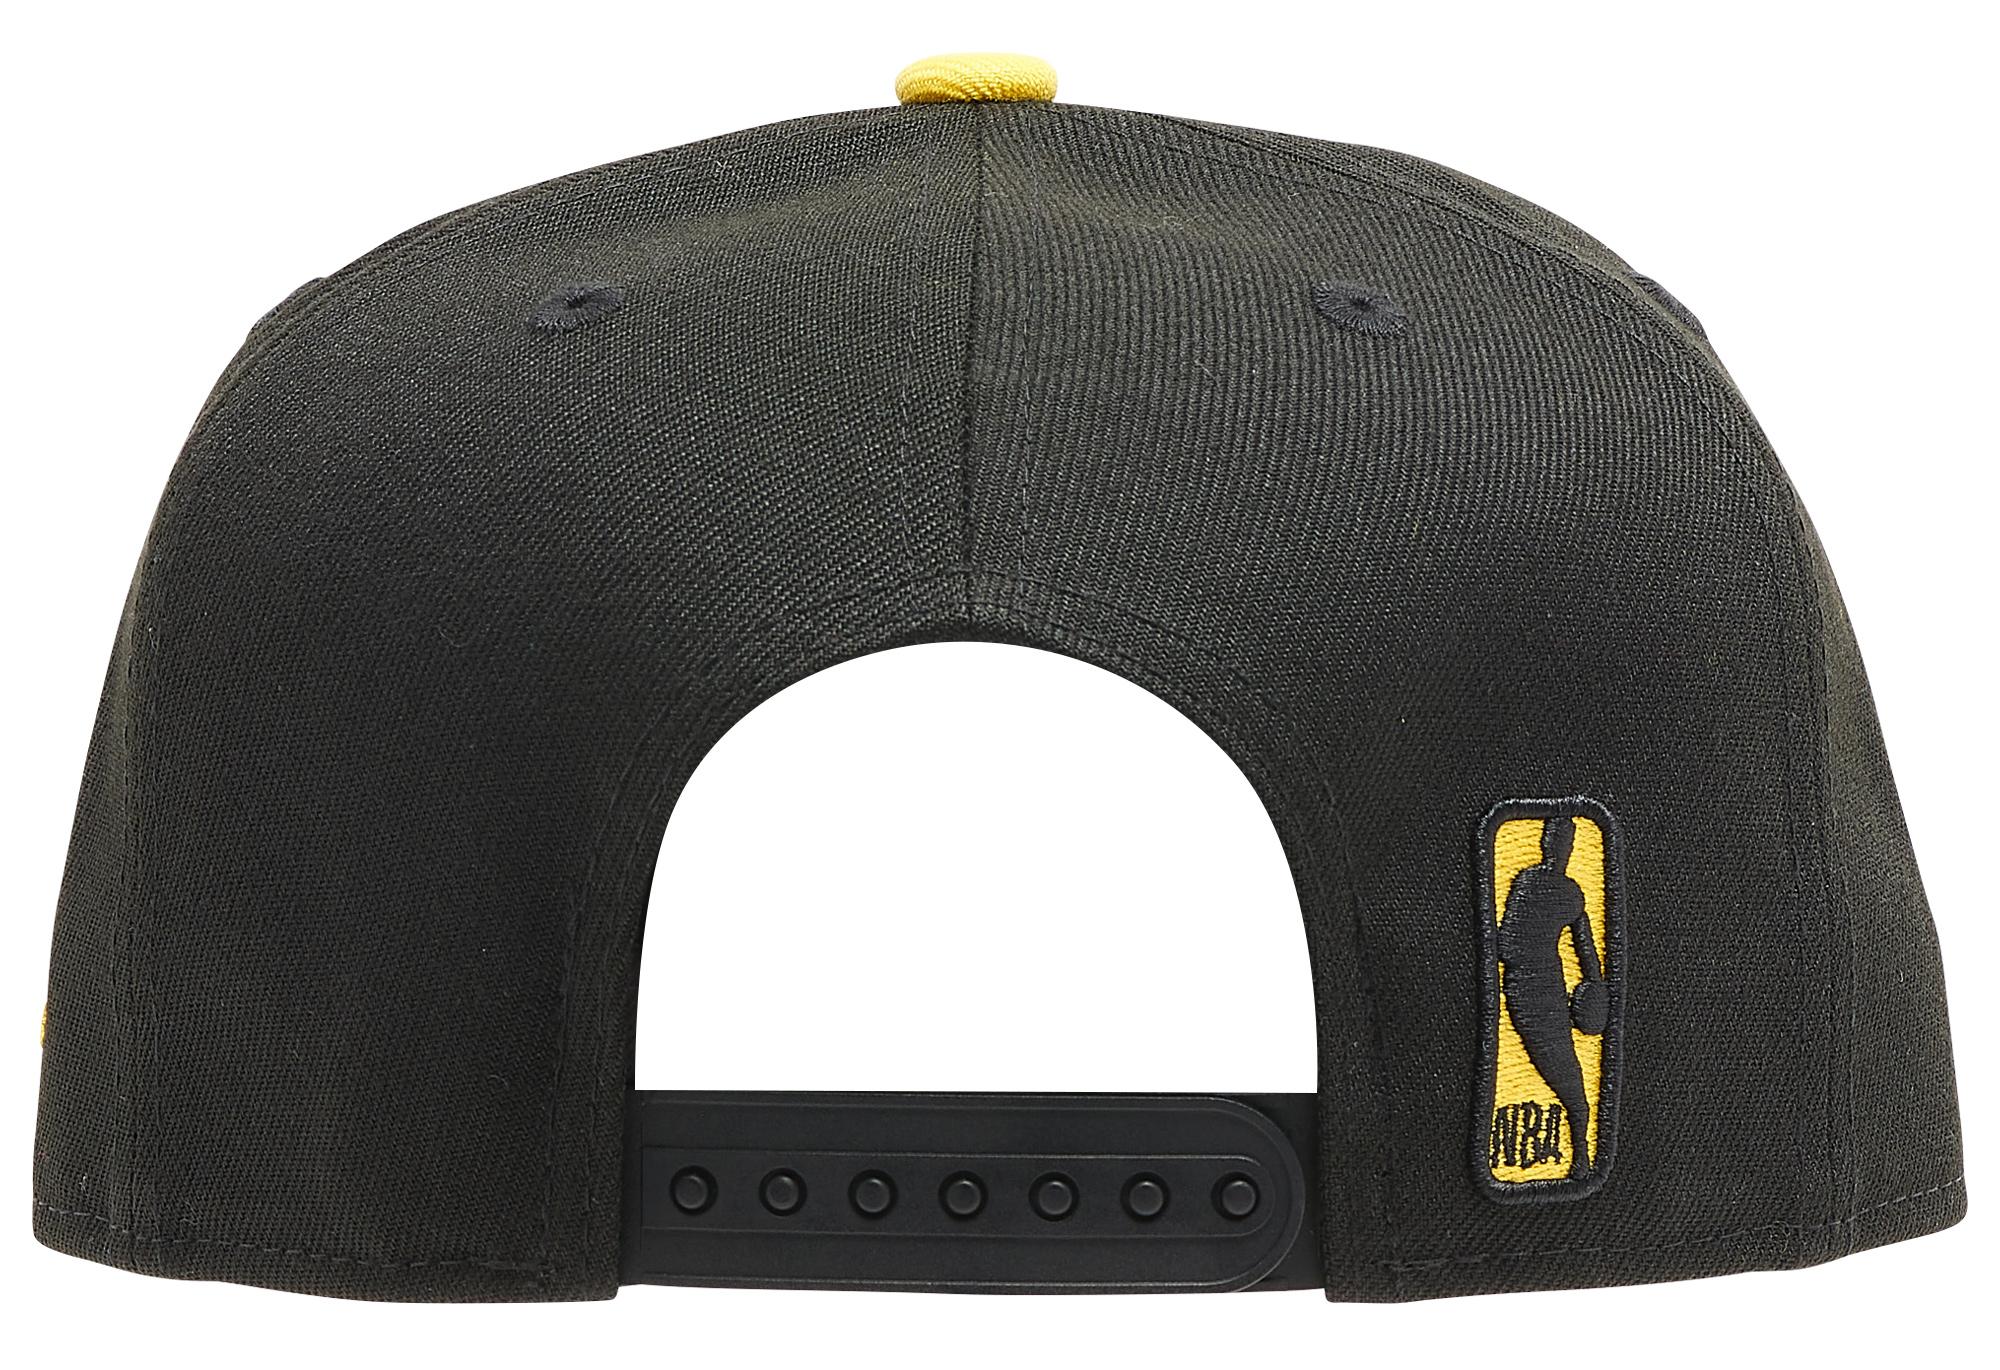 new-era-nba-2-tone-black-yellow-snapback-hat-1